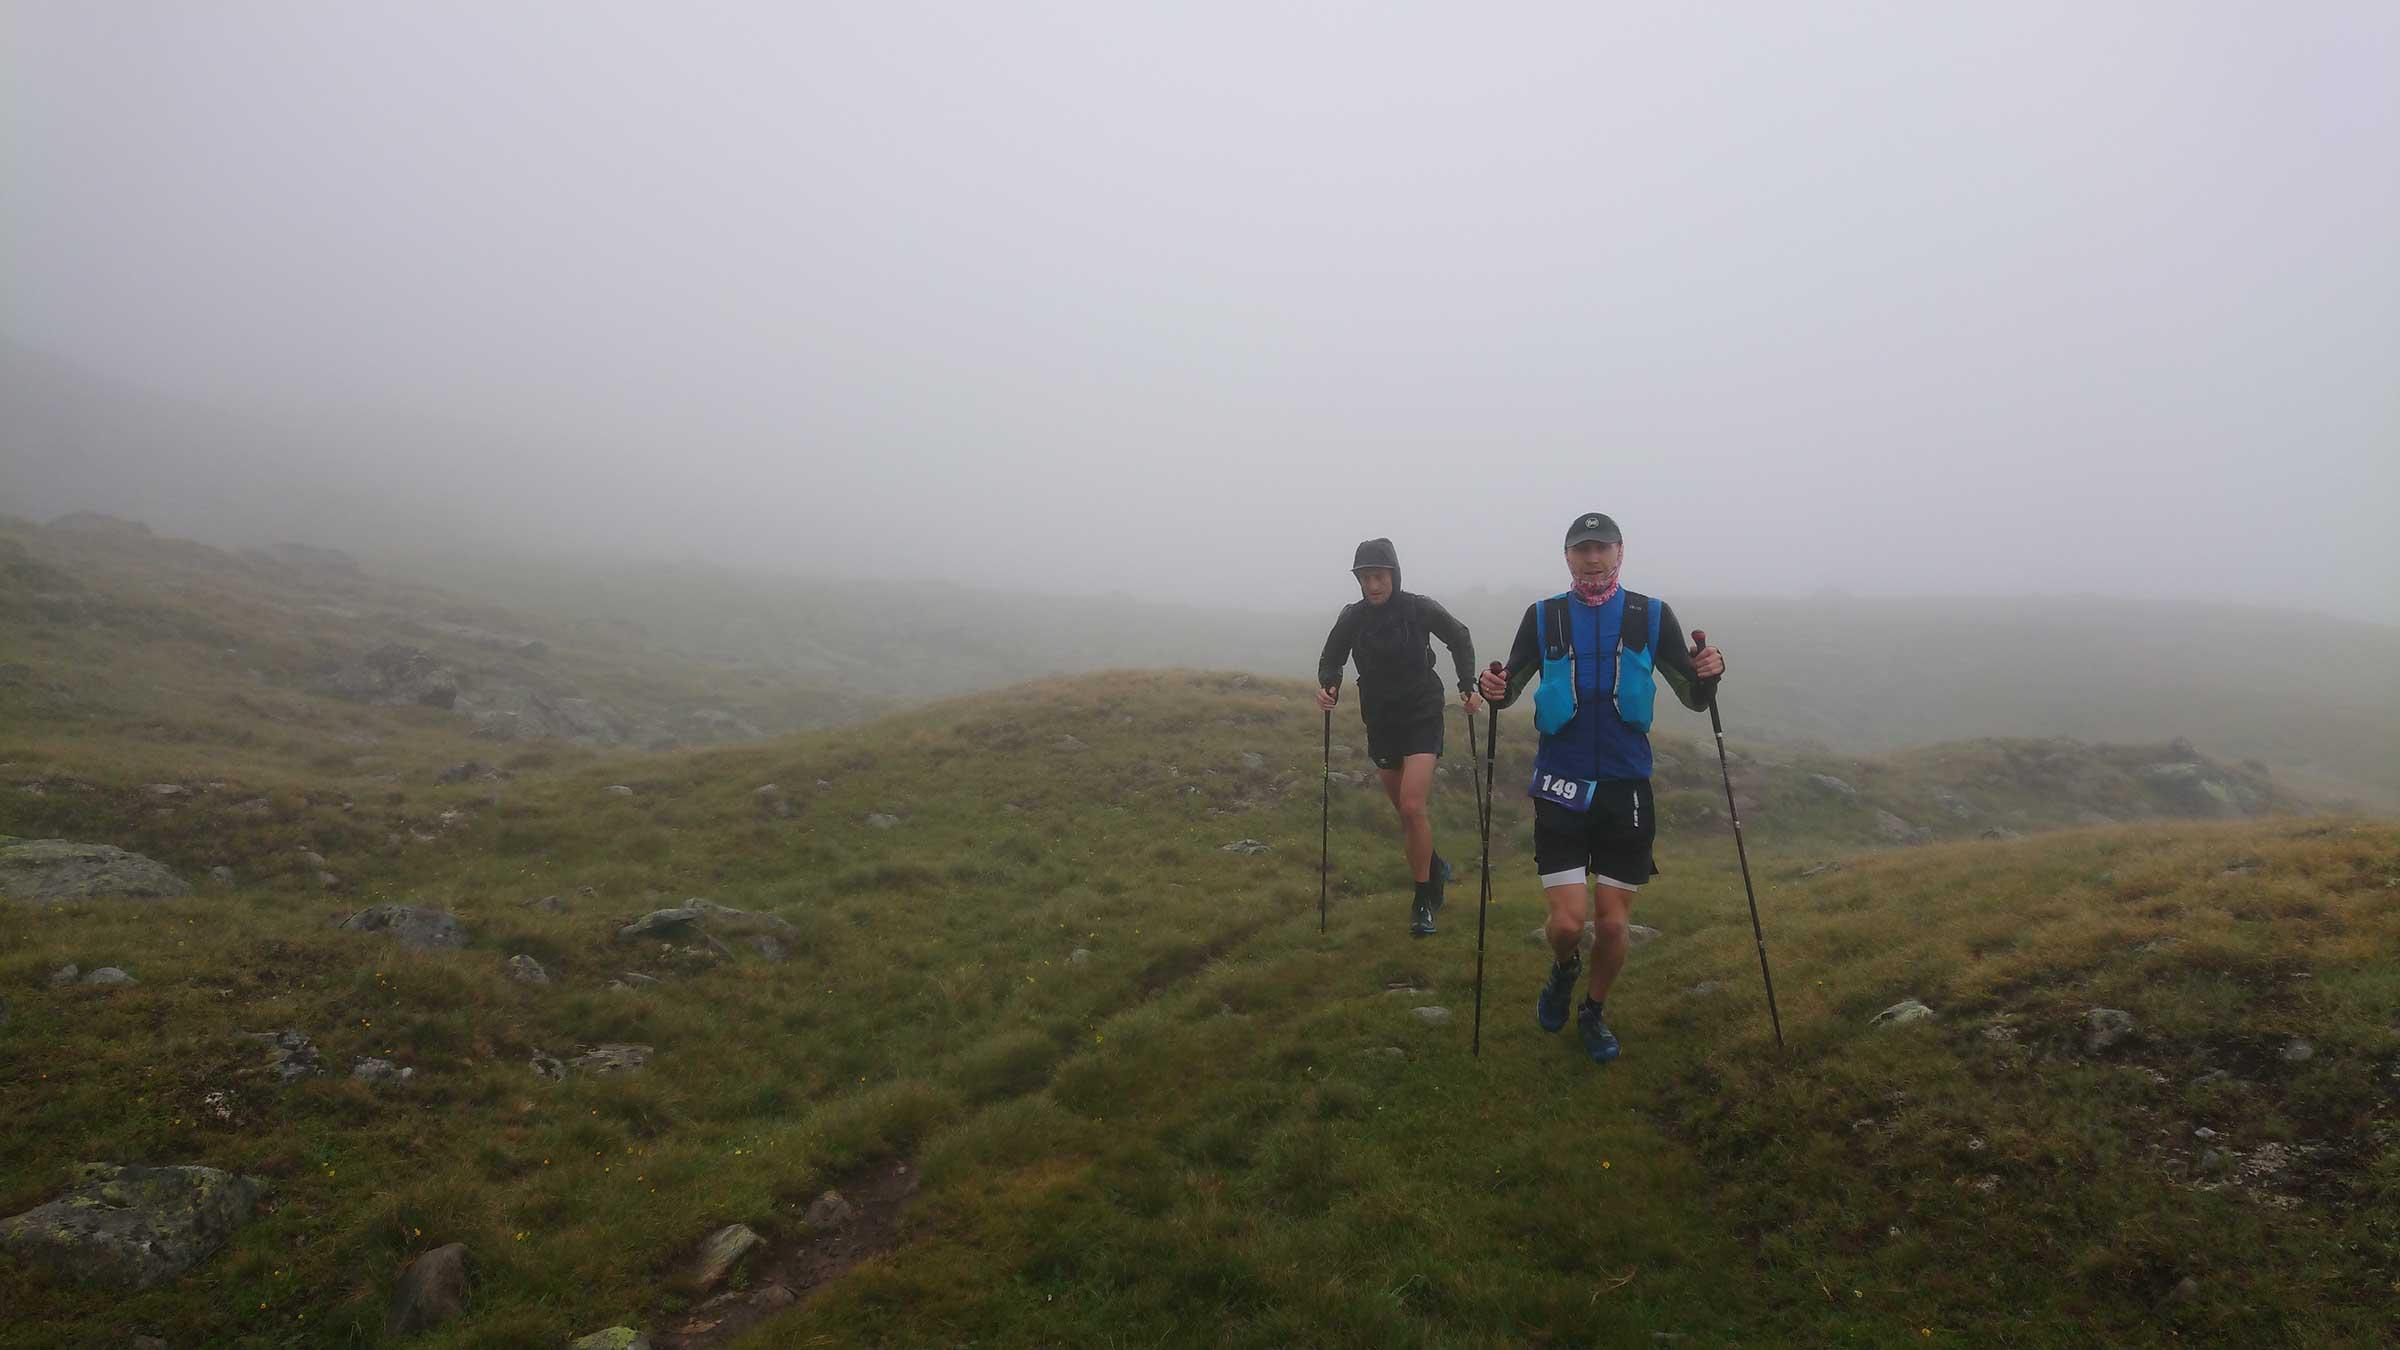 Zwei Gletschertrailrun-Teilnehmer im Nebel - Gletscher Trailrun Obergurgl-Hochgurgl